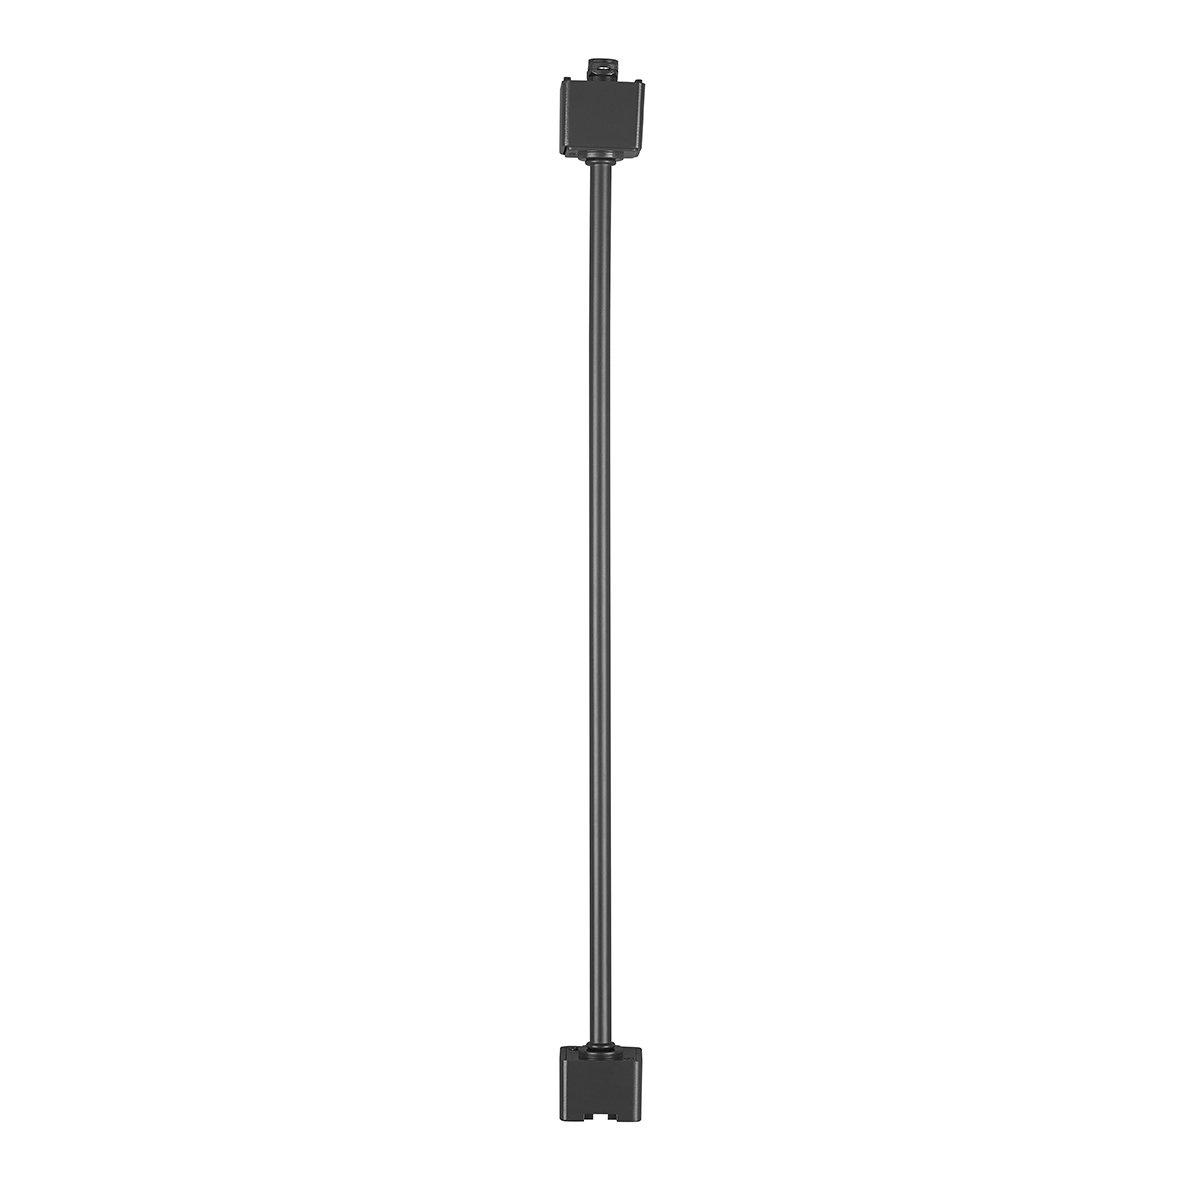 Wac Lighting H18 Bk H Track 18 Extension For Line Low Voltage Wiring Box Walmartcom Fixture Black Home Improvement